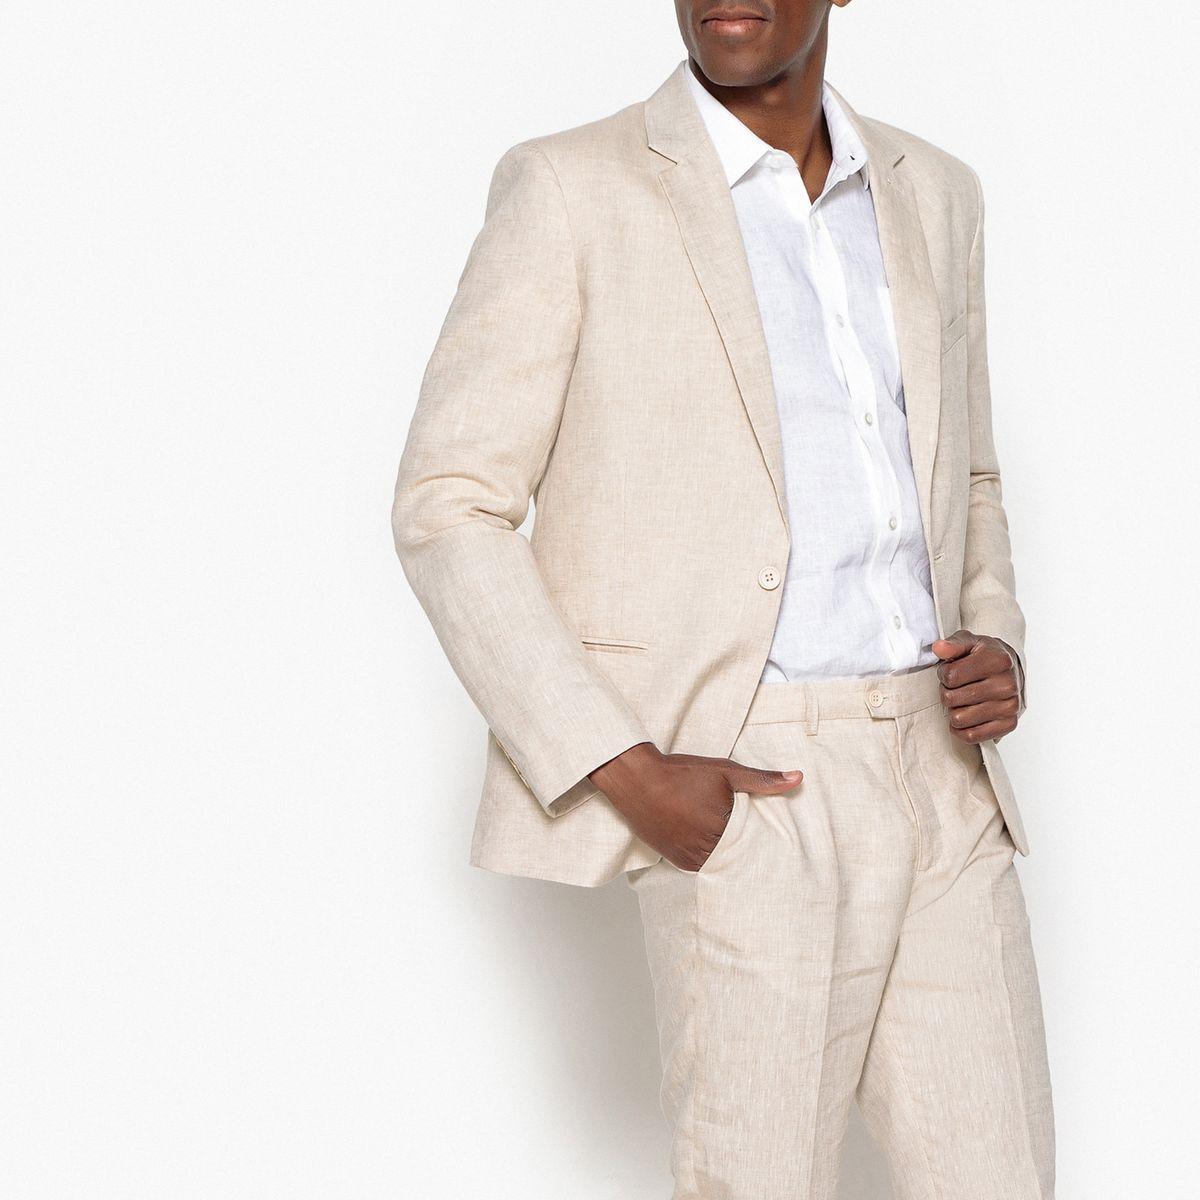 Veste de costume slim en lin/coton - Tailles 42, 46, 48 & 52